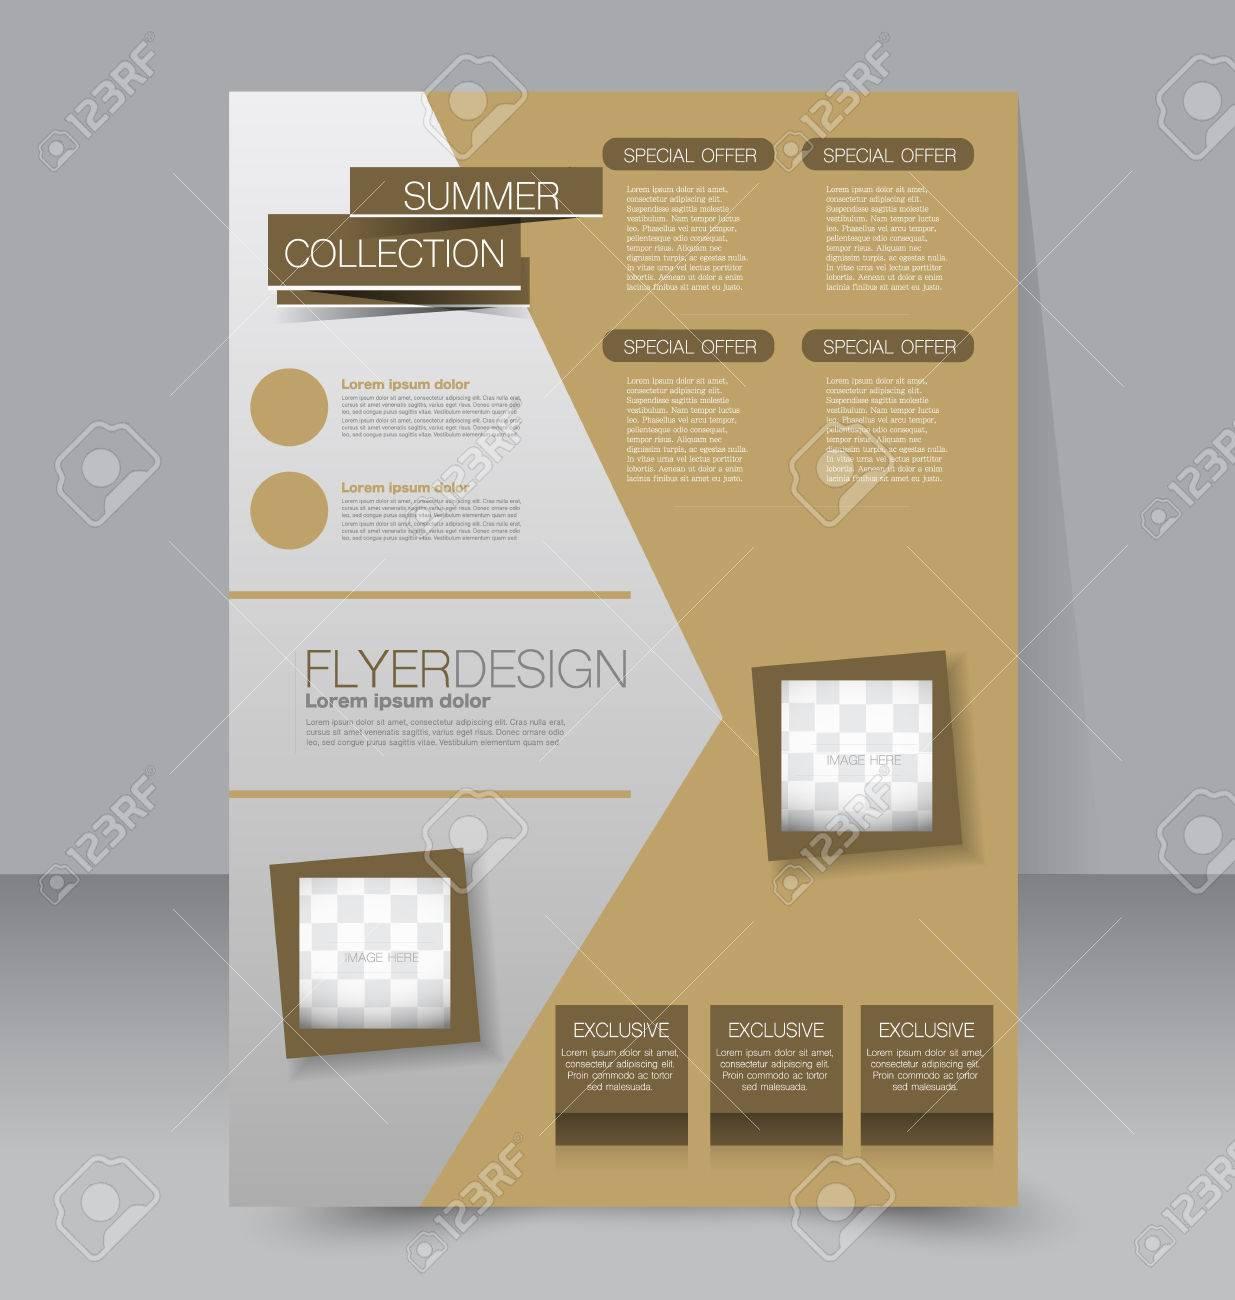 Poster design education - Editable A4 Poster For Design Education Presentation